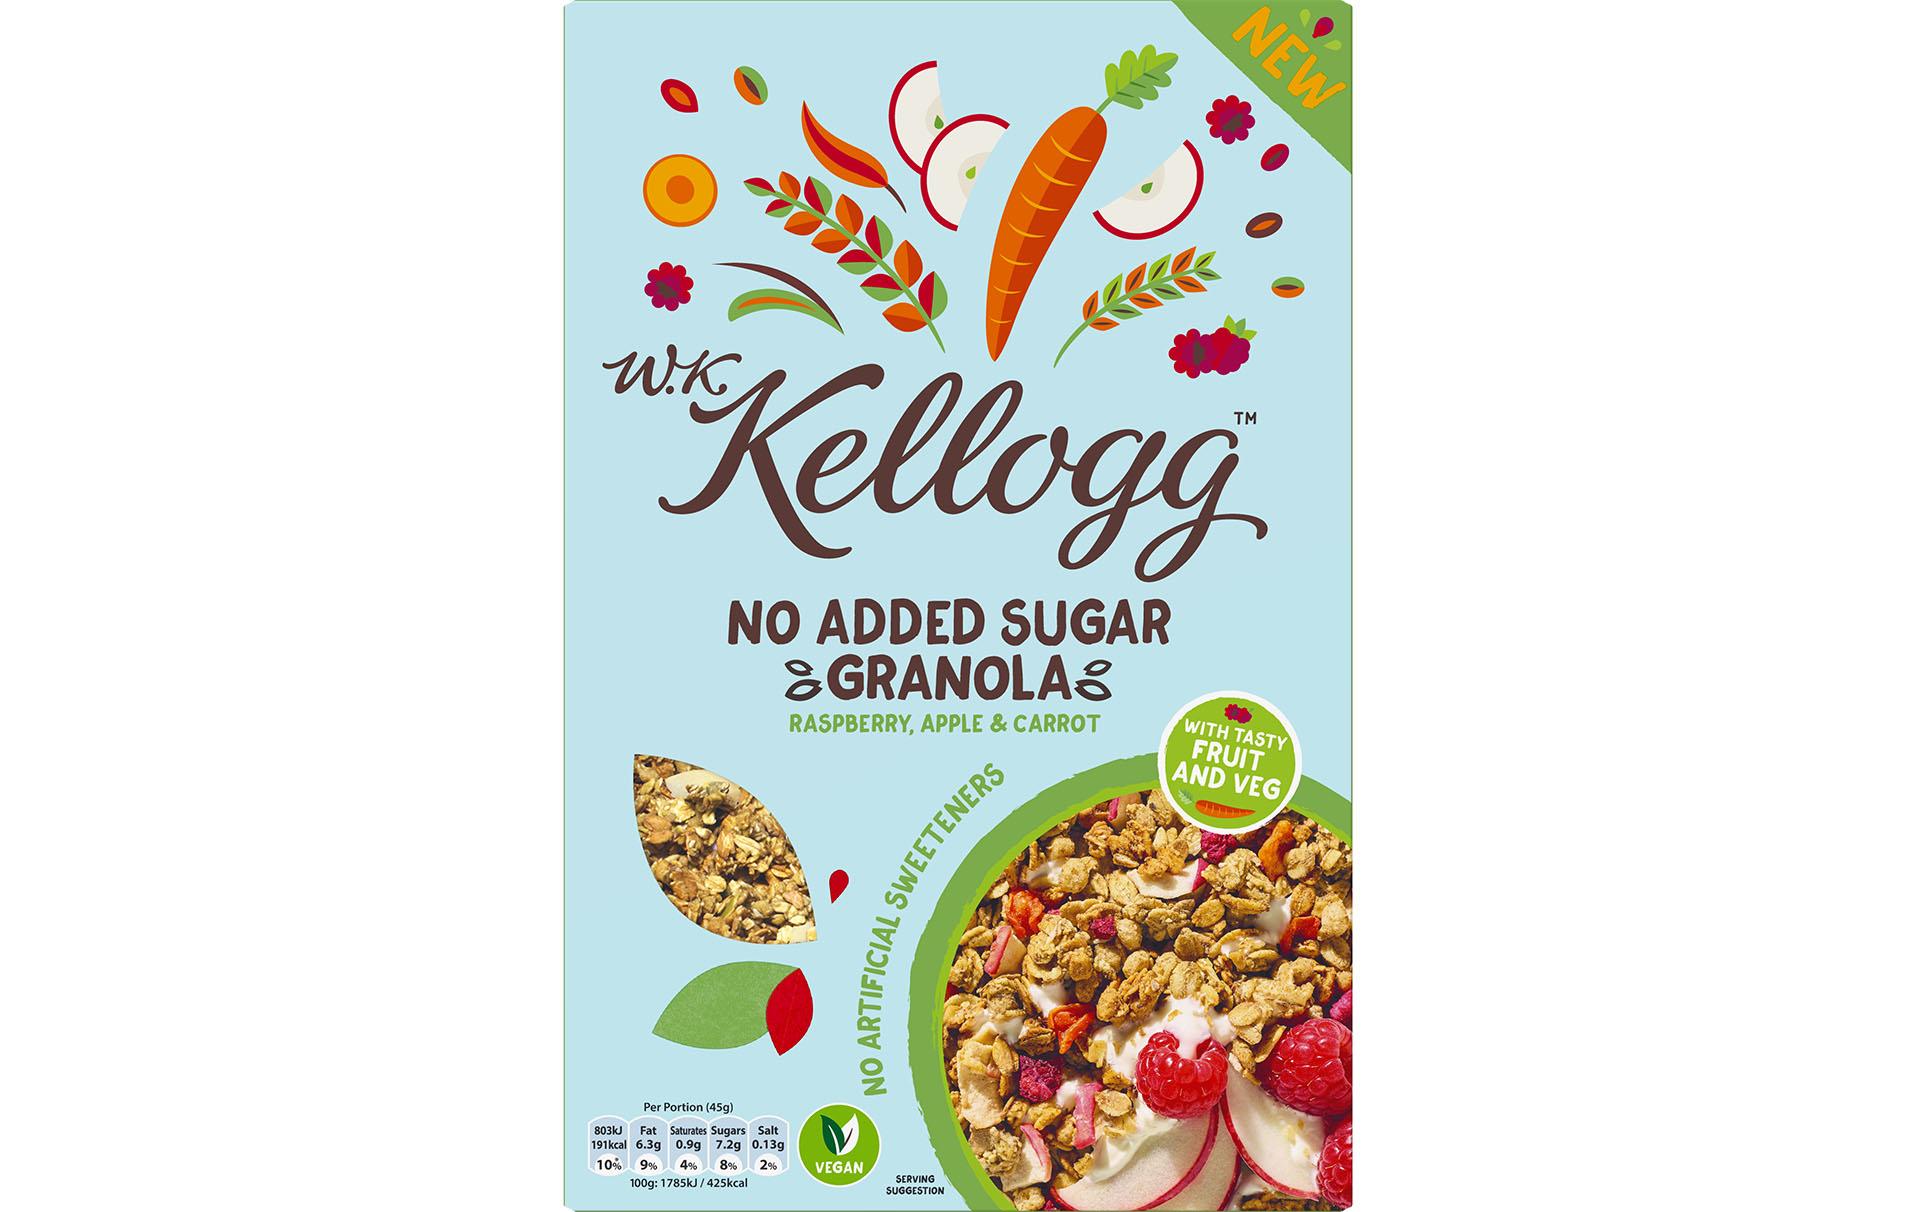 kellogg's carrot granola